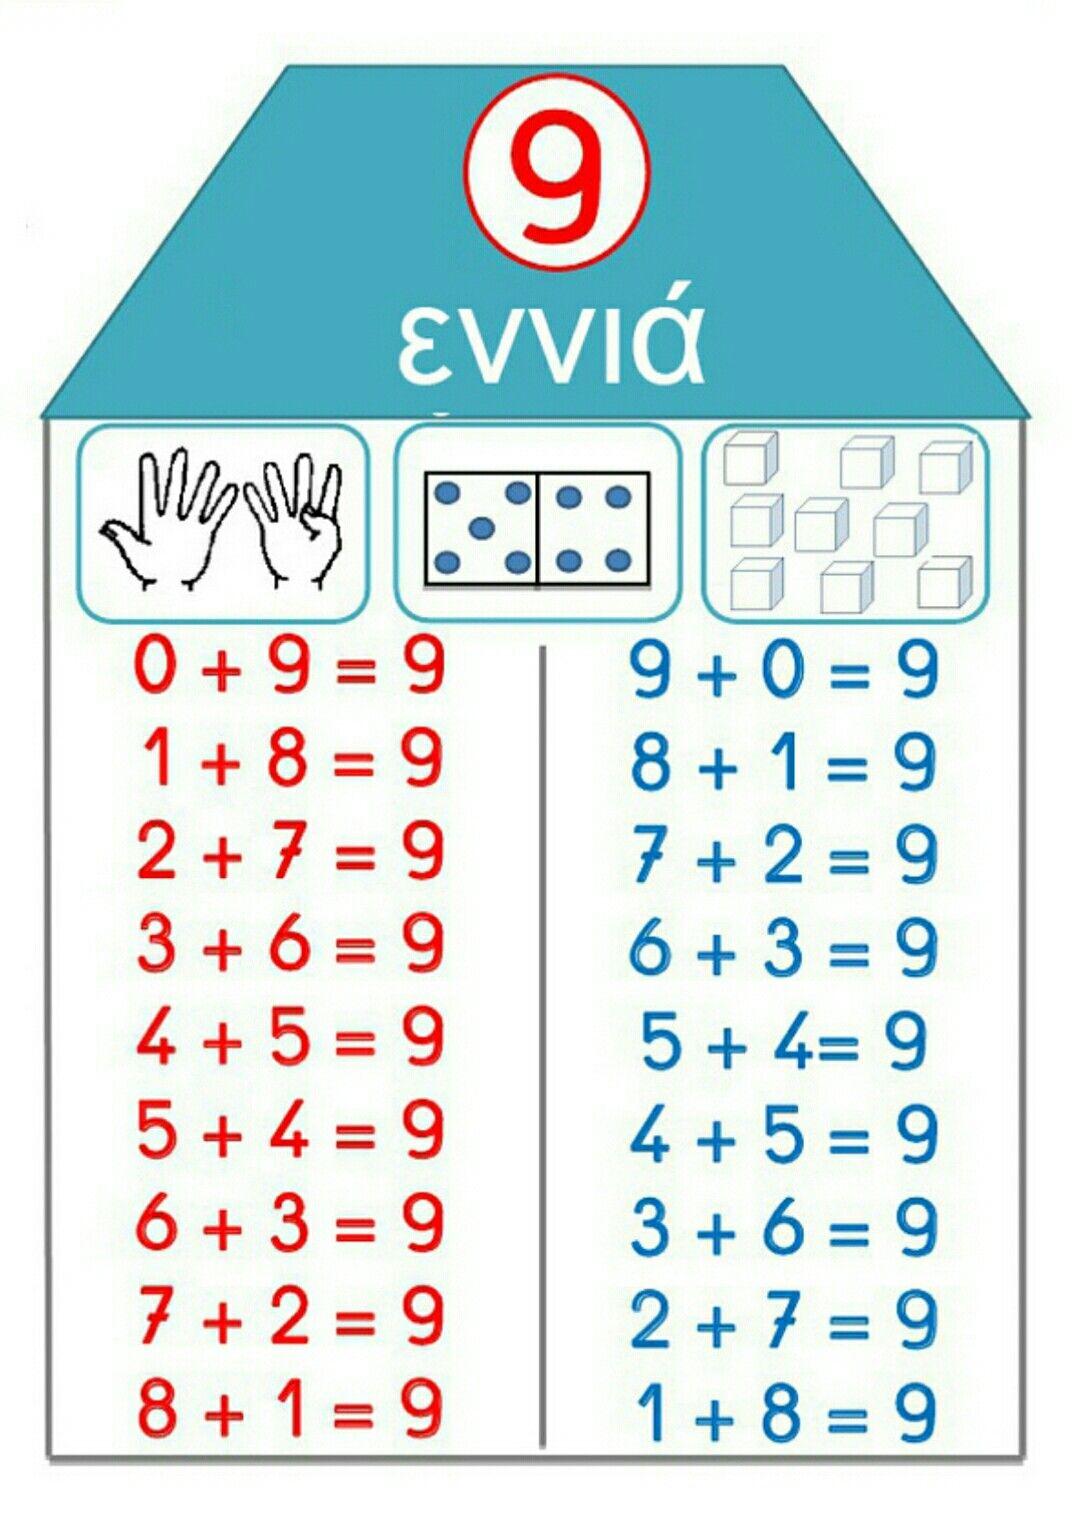 Pin By Salariu Oana On A Dhmotikoy Math For Kids Math Expressions Teaching Math [ 1518 x 1080 Pixel ]